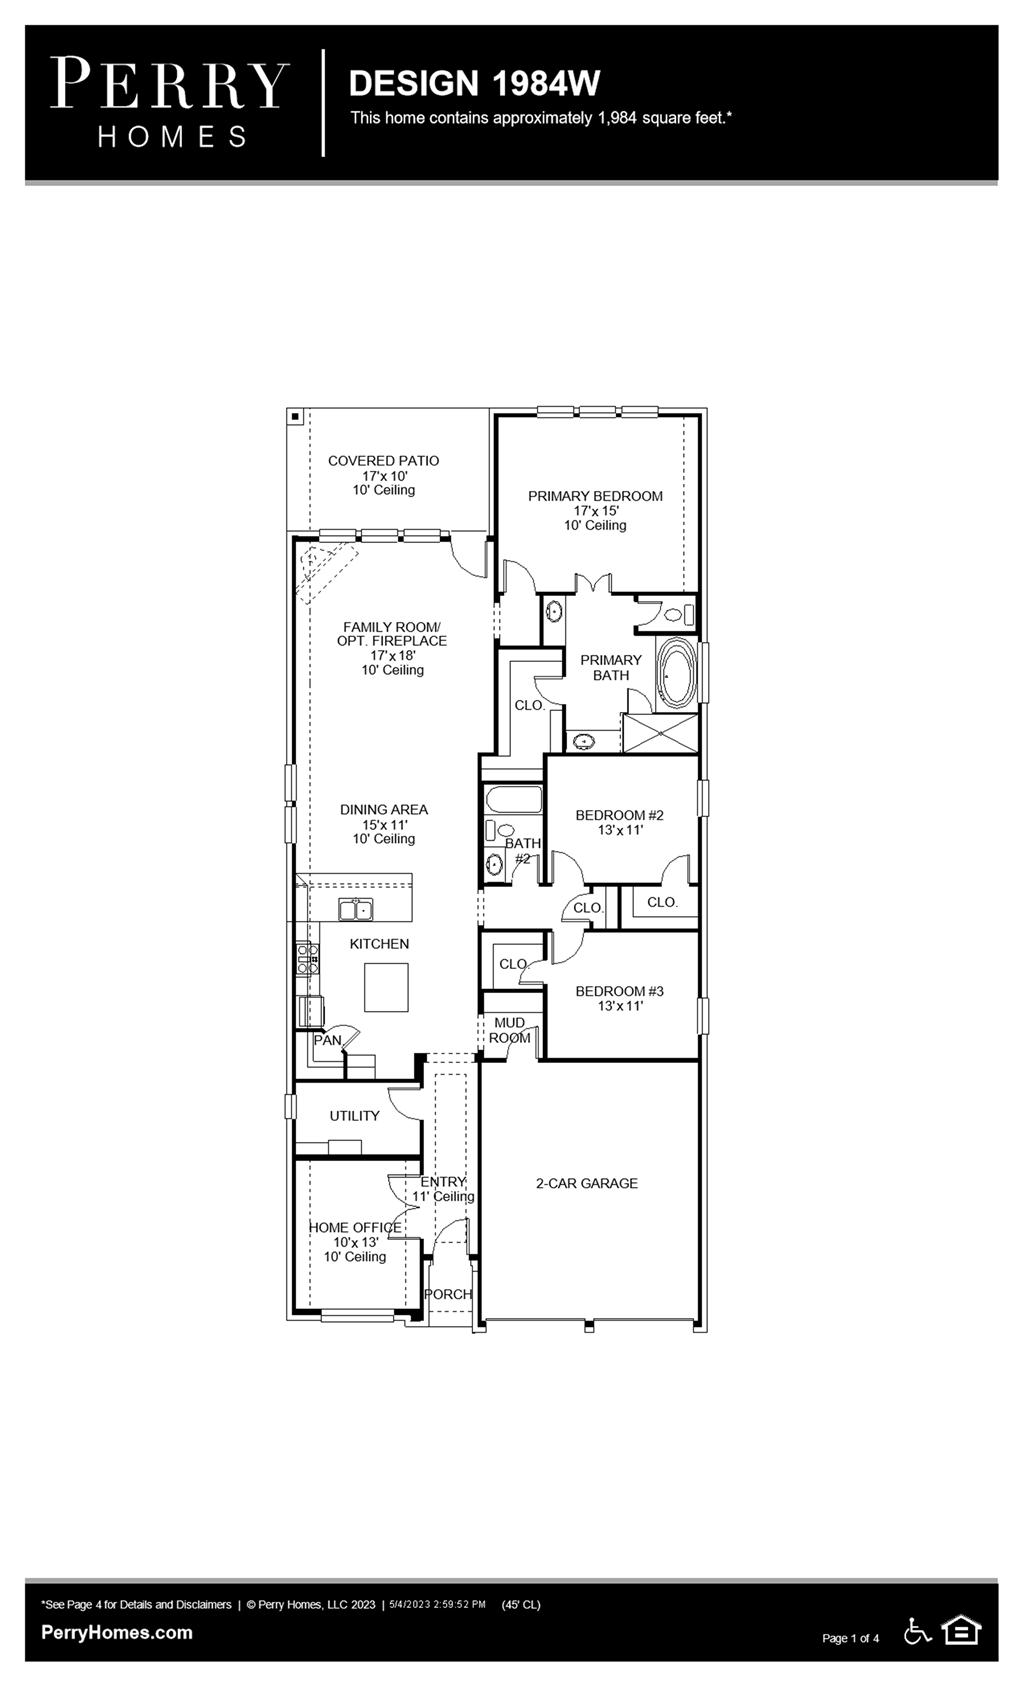 Floor Plan for 1984W